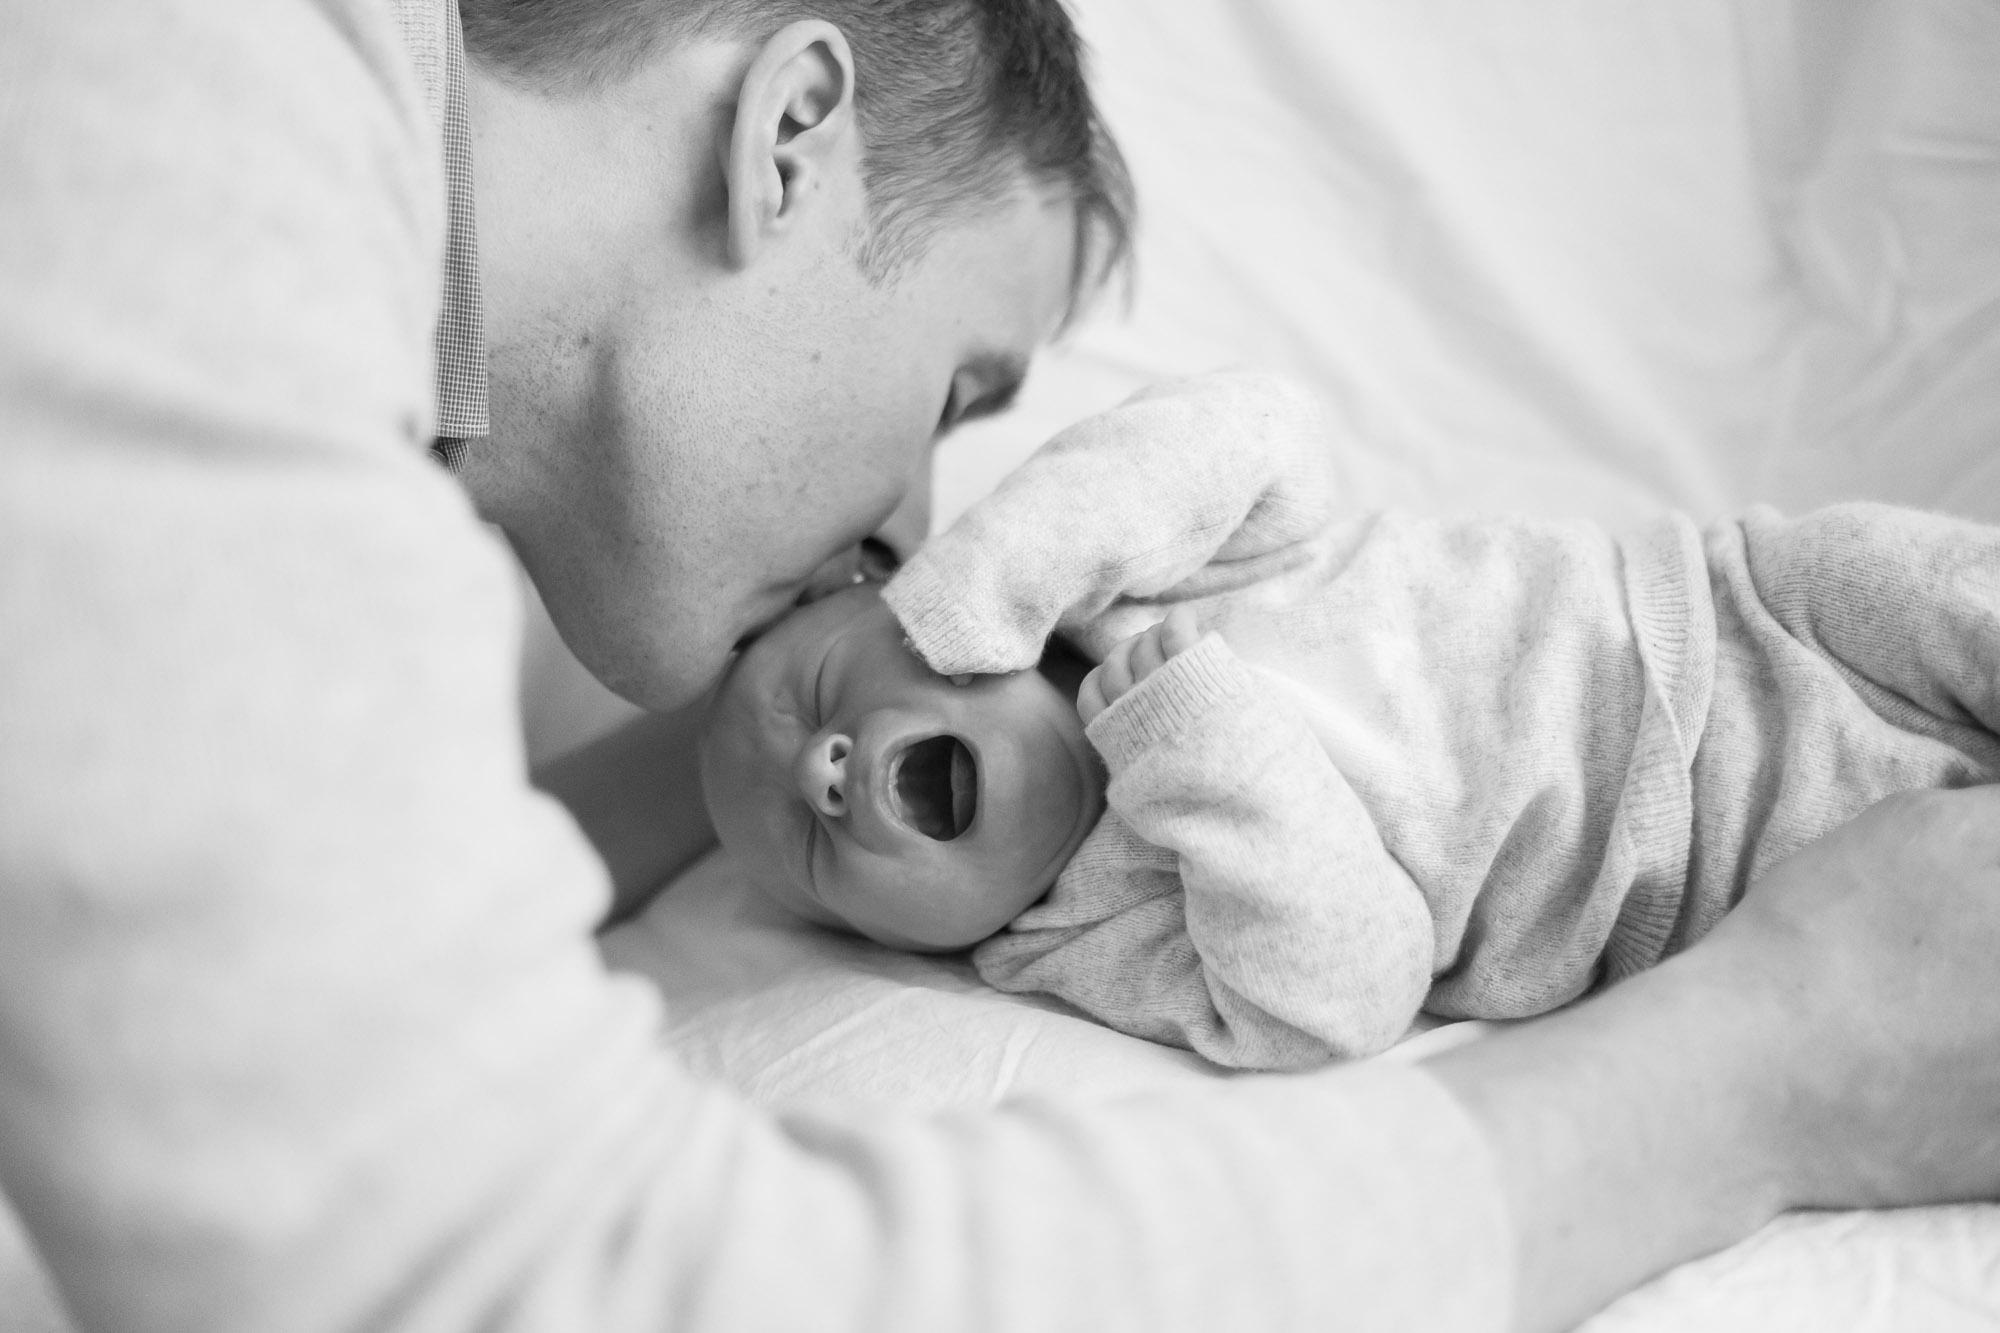 newborn-baby-family-portrait-photographer-133.jpg